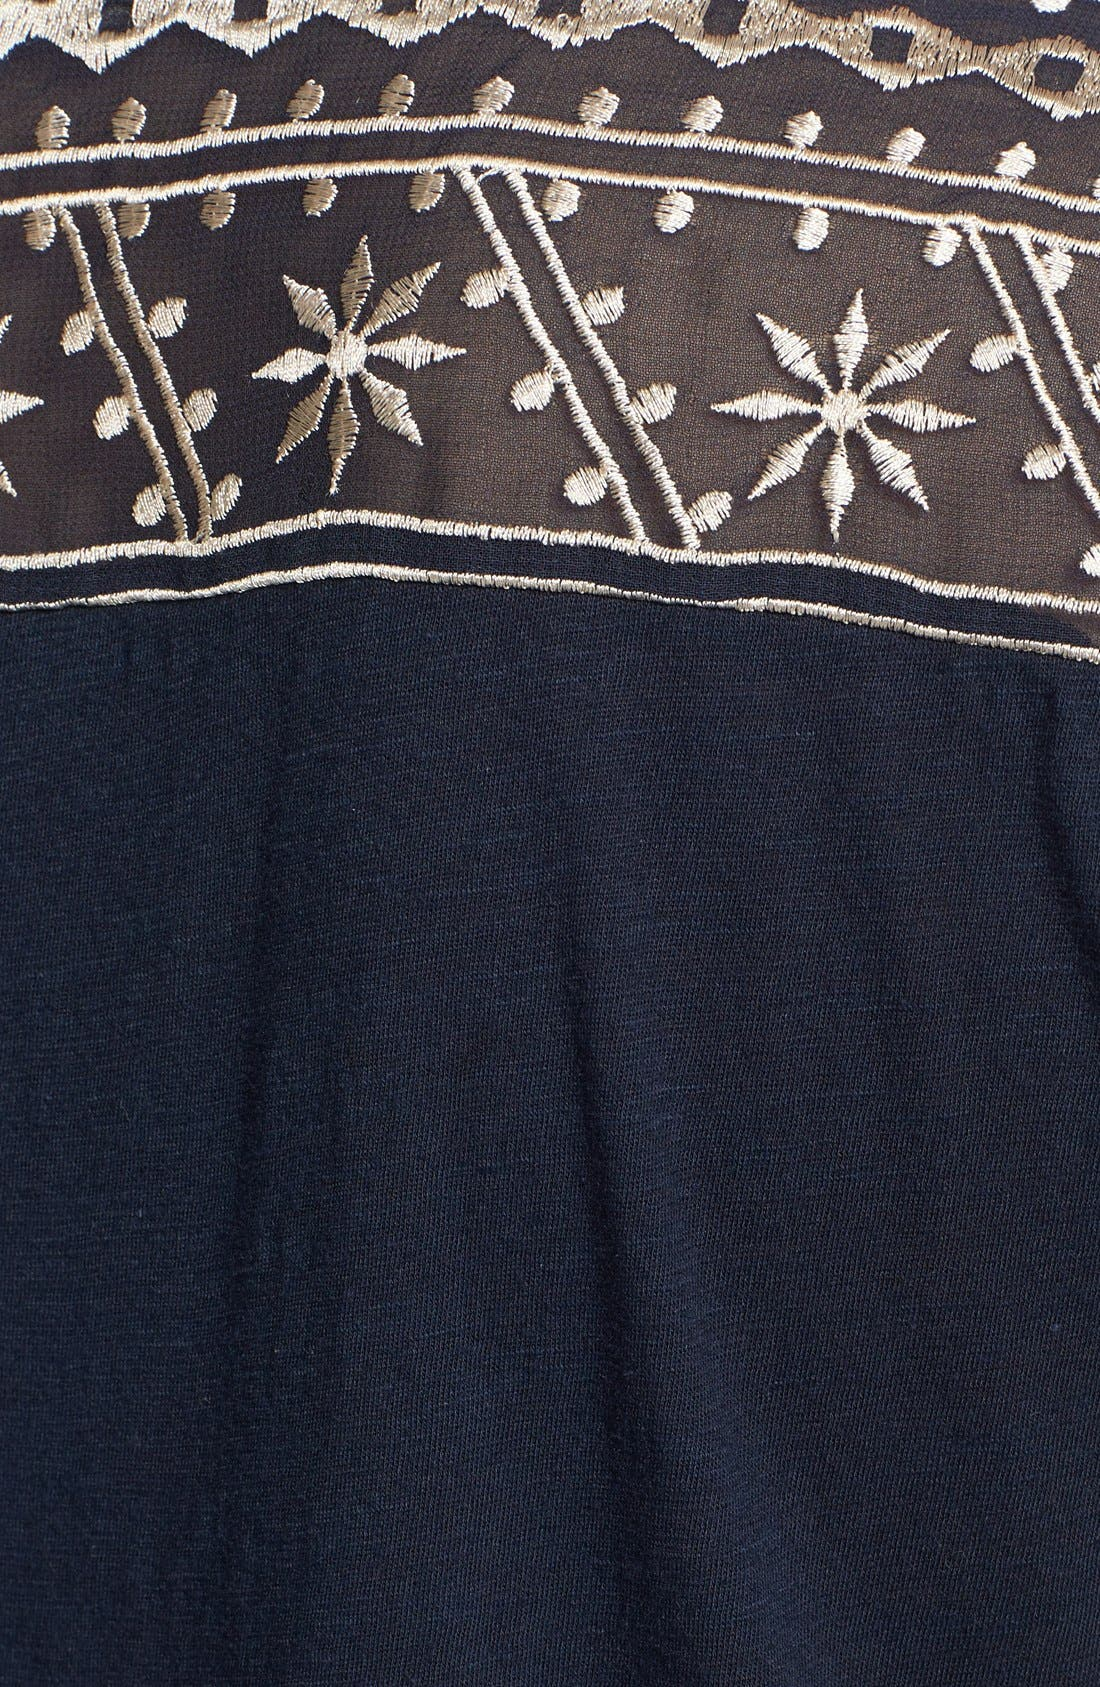 Alternate Image 3  - Lucky Brand 'Kiana' Embroidered Tunic Top